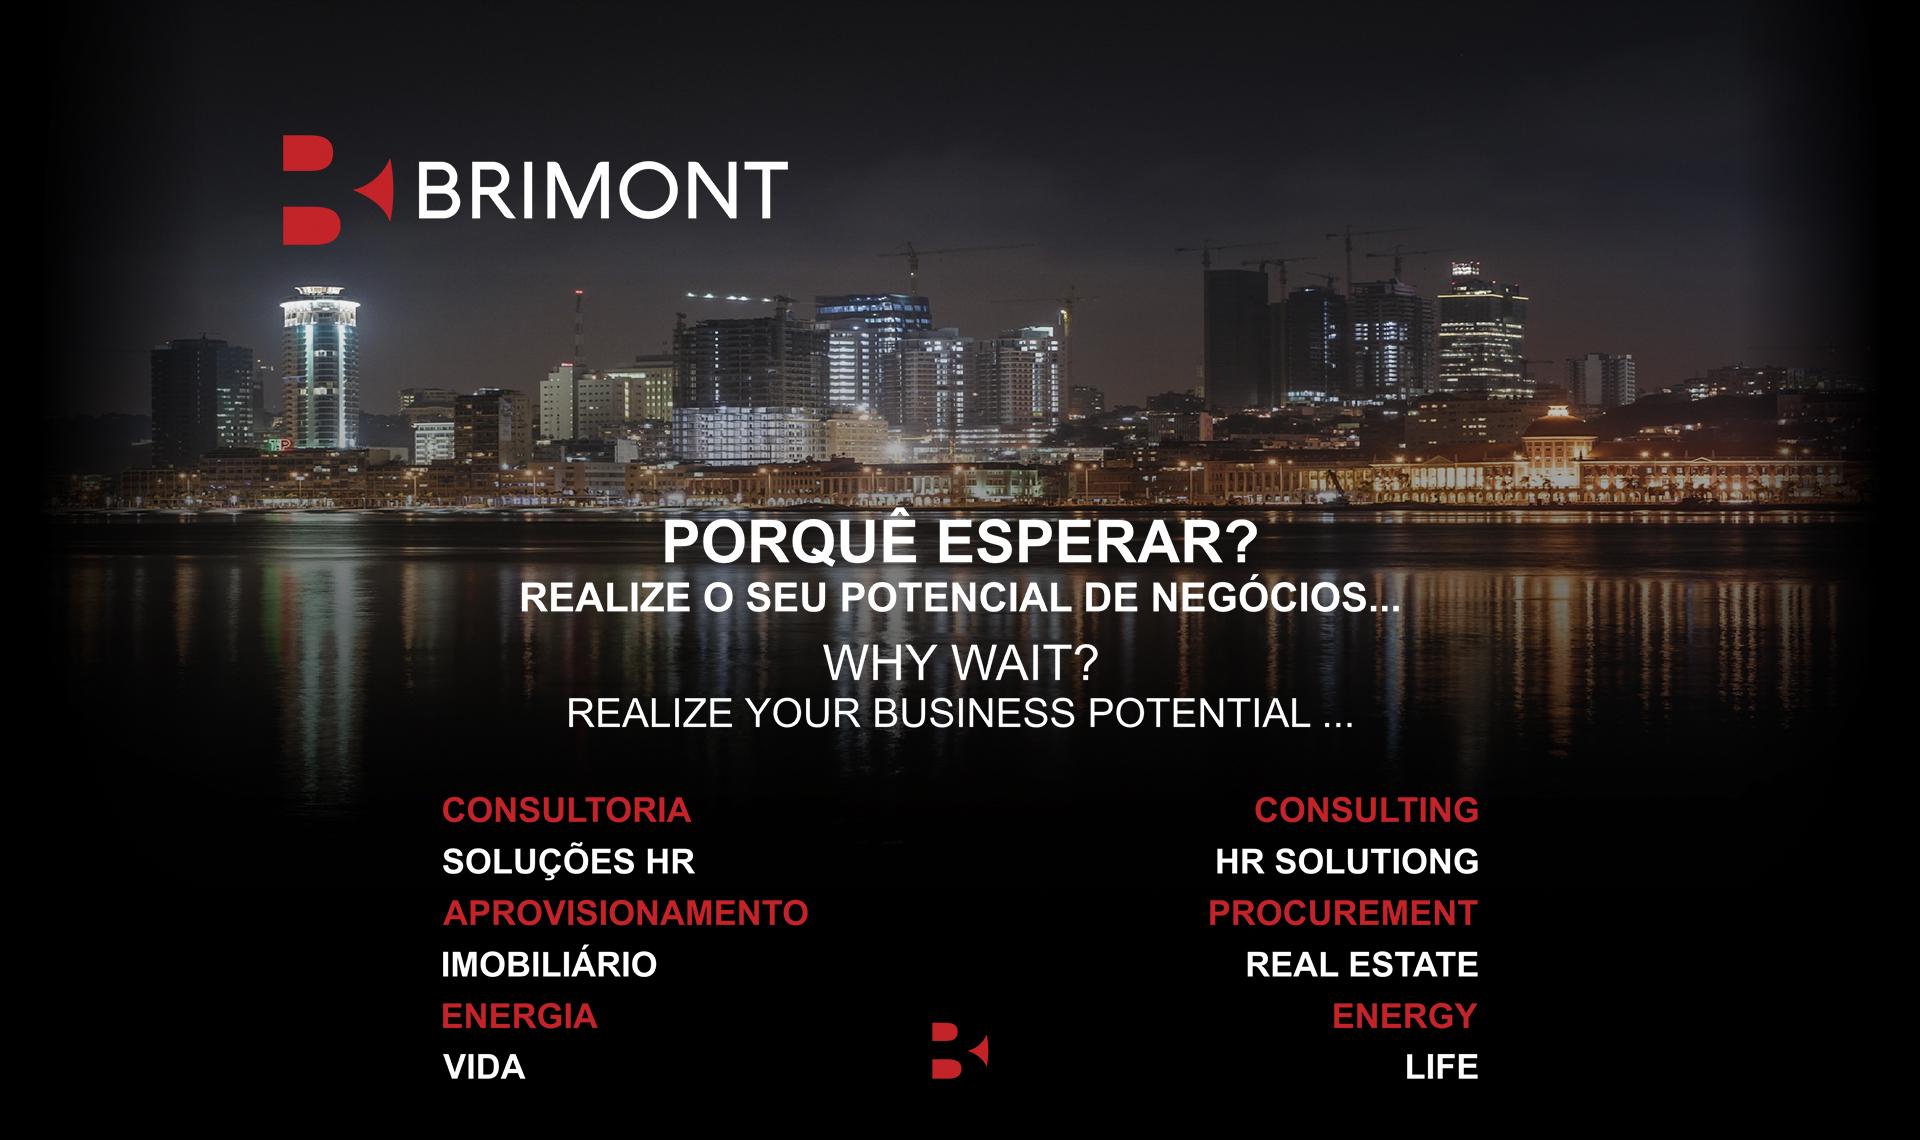 brimont international